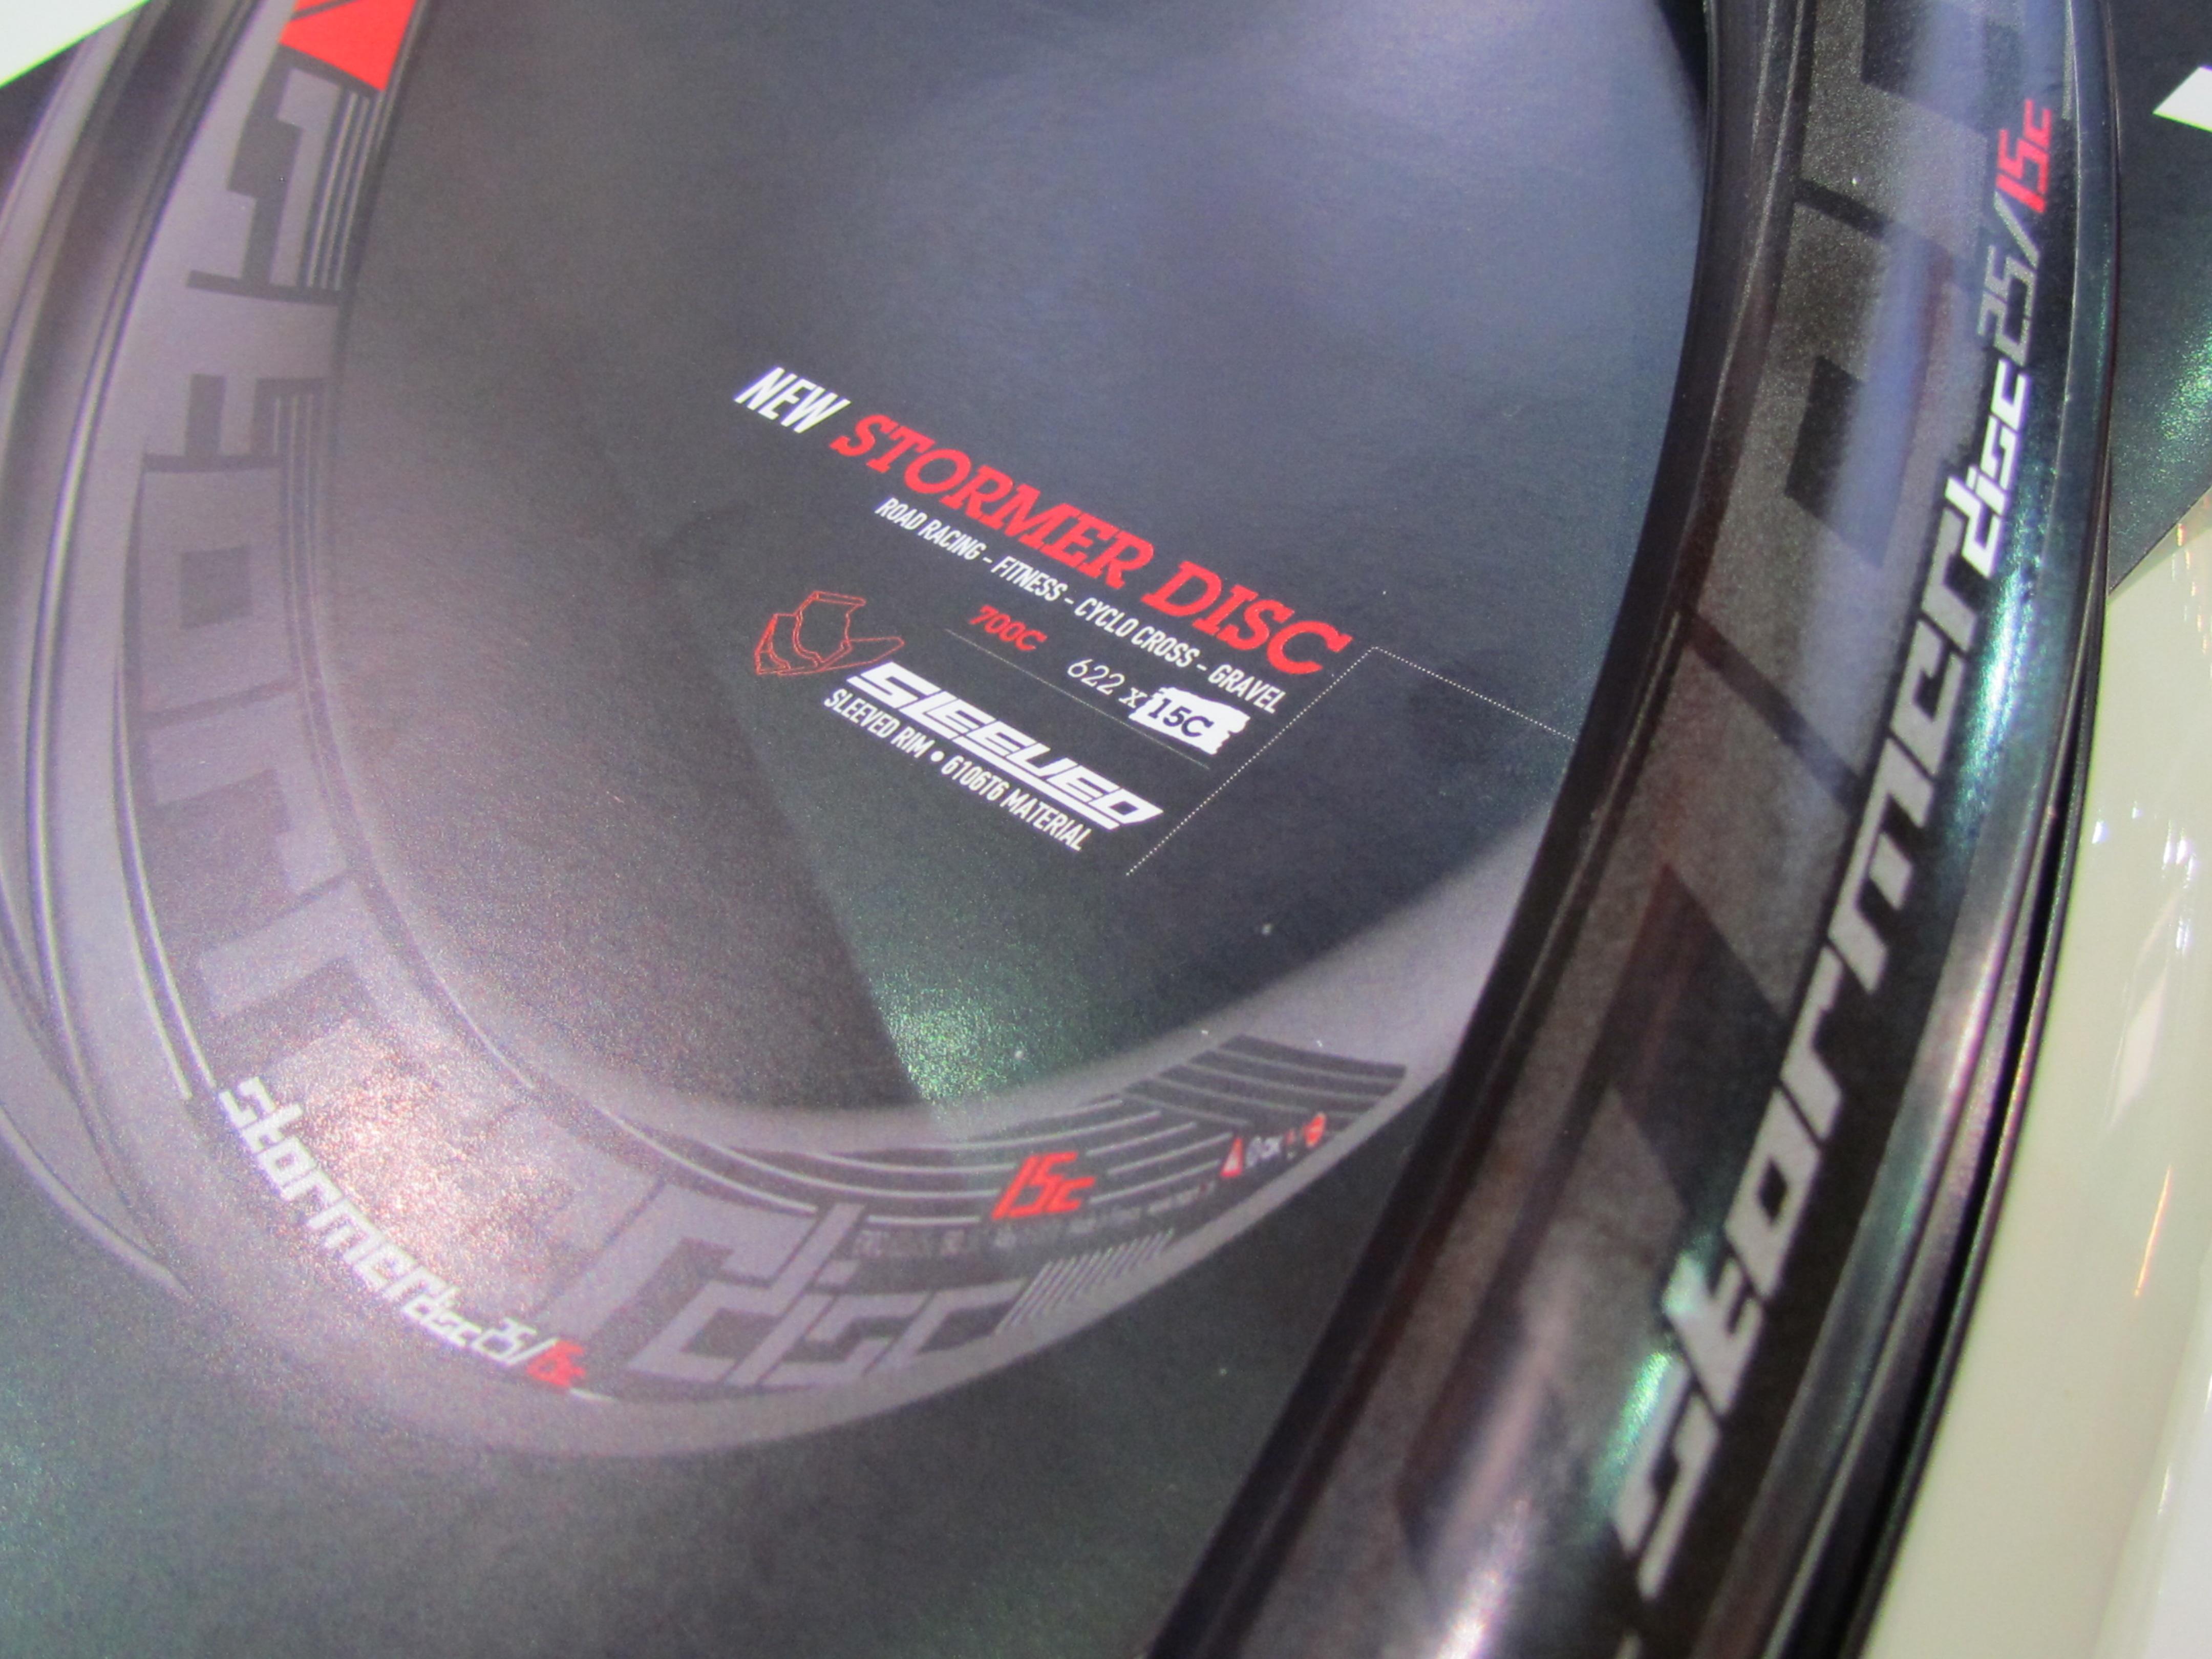 mach 1 race rims targeting disc brake road bikes bike europe mach 1 race rims targeting disc brake